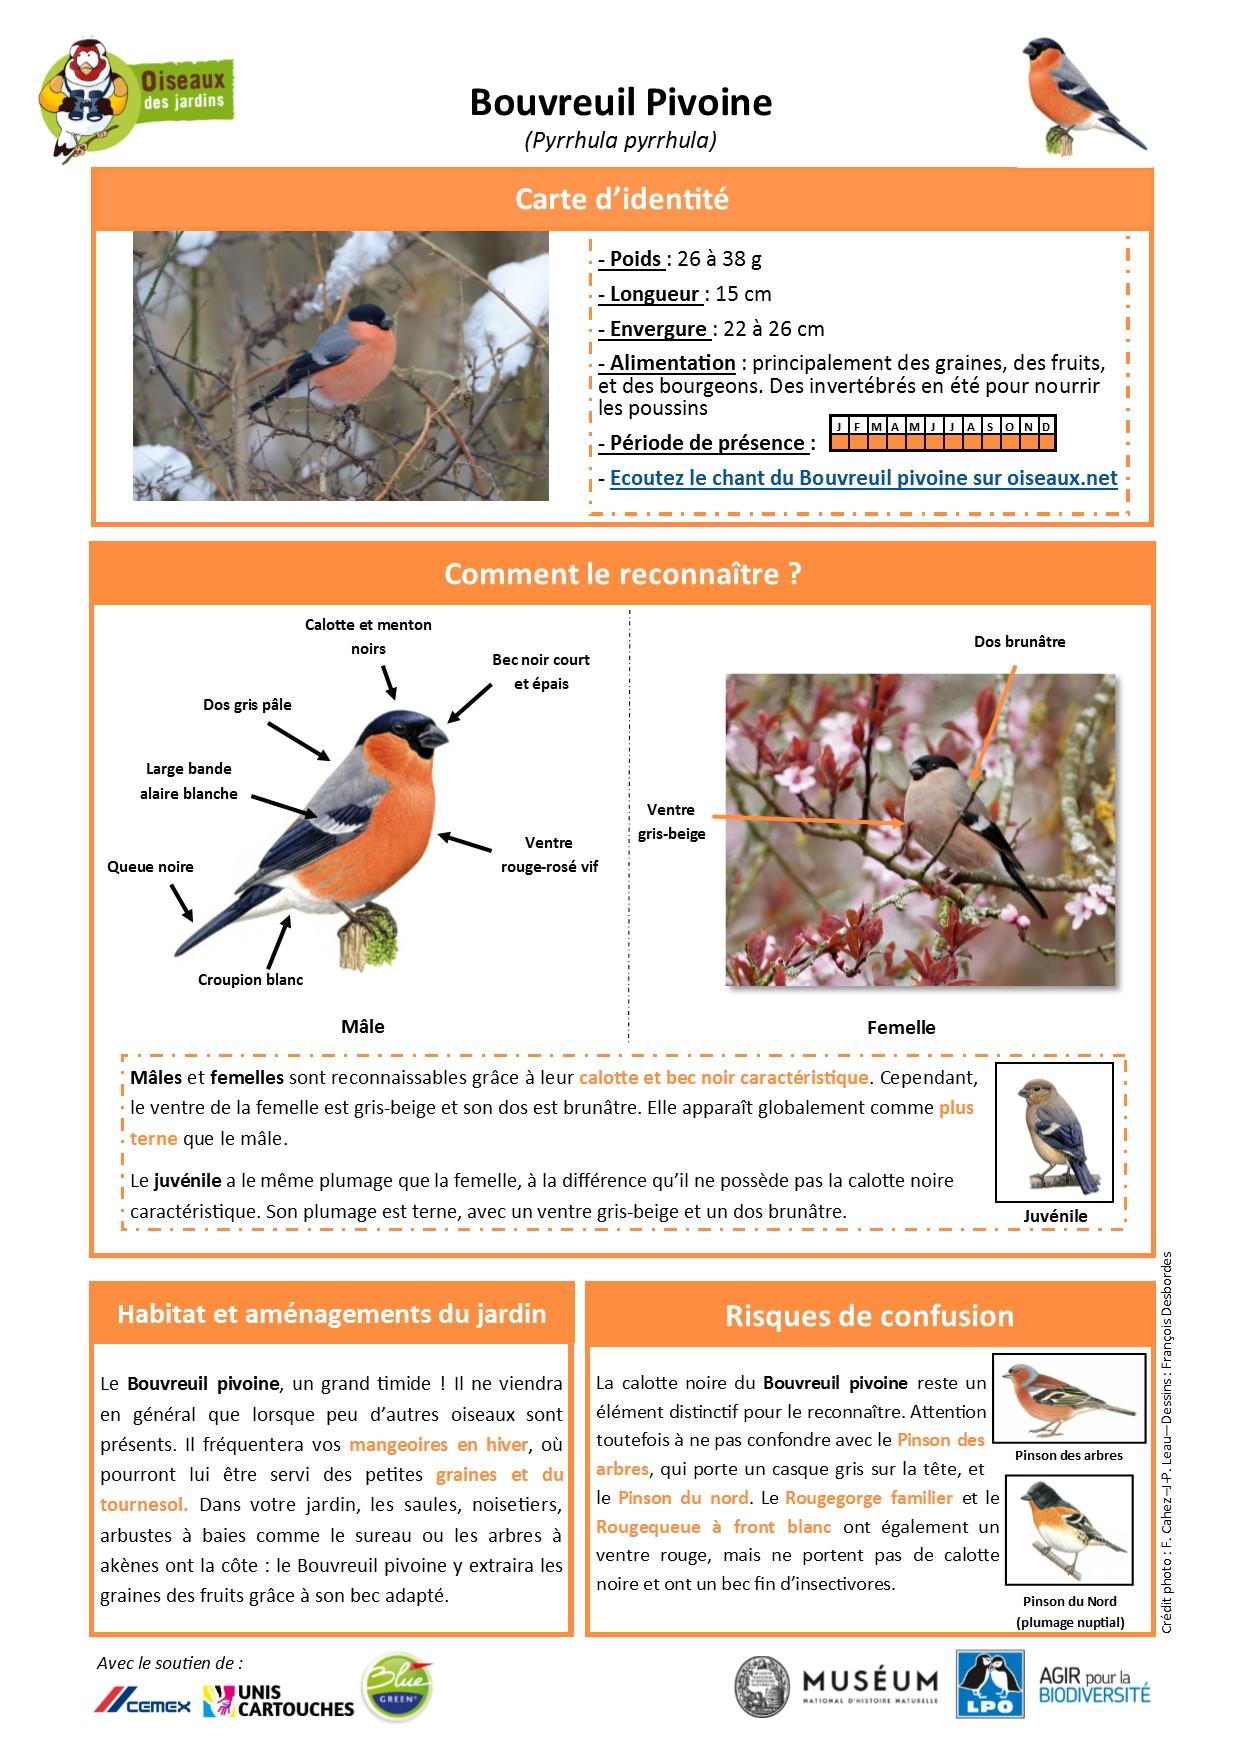 https://cdnfiles1.biolovision.net/www.oiseauxdesjardins.fr/userfiles/Fichesespces/FicheespceBP.pdf